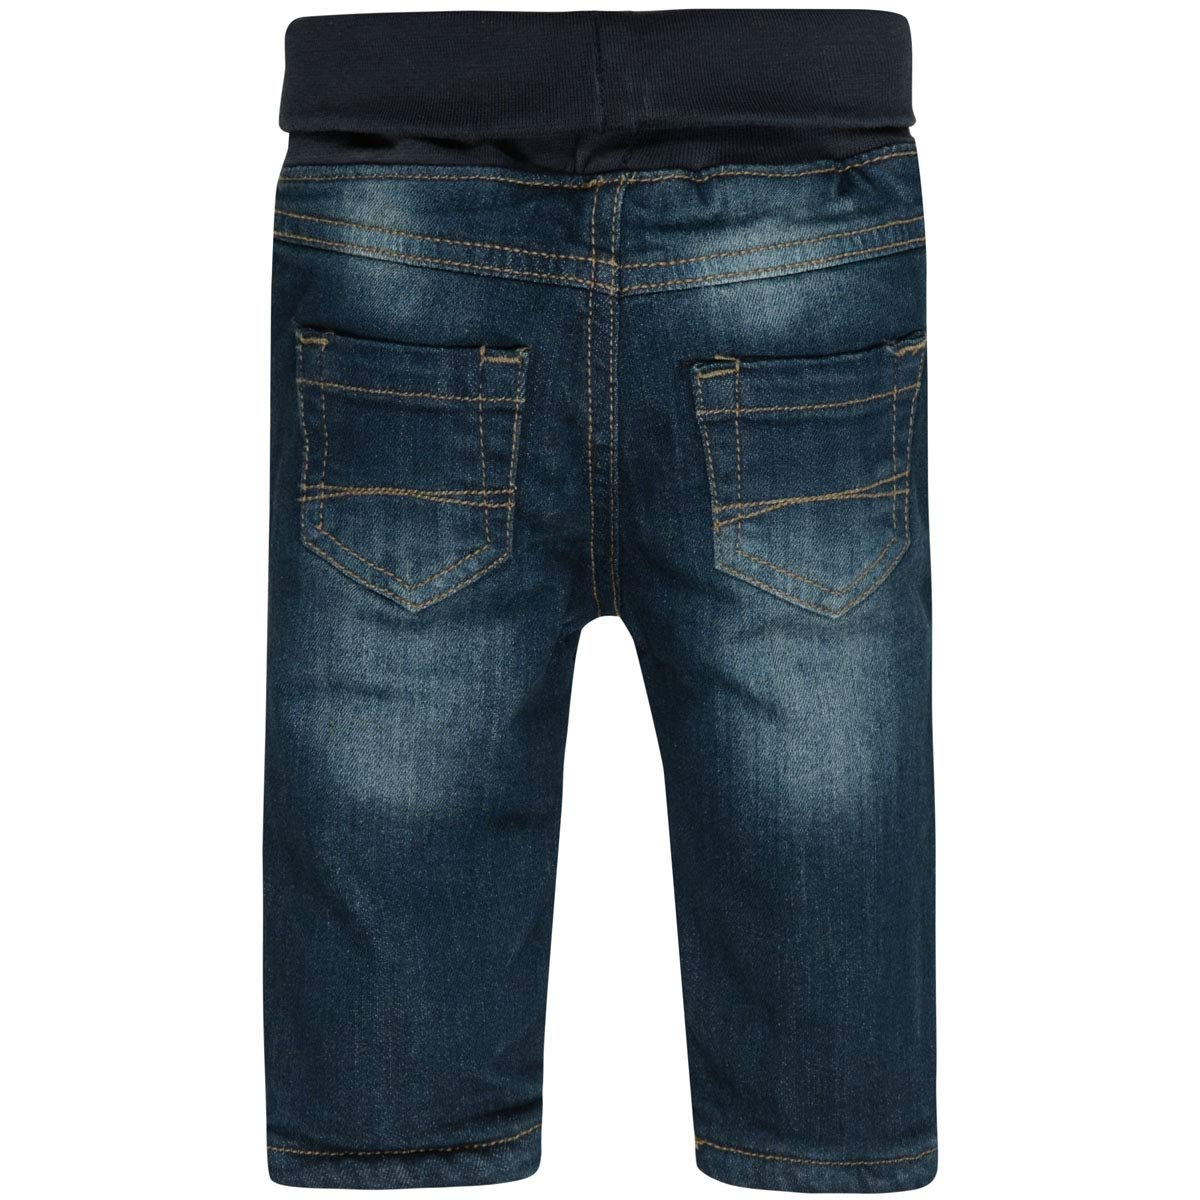 230054797 Staccato Unisex Regular Fit Baby Gef/ütterte Unisex Jeans